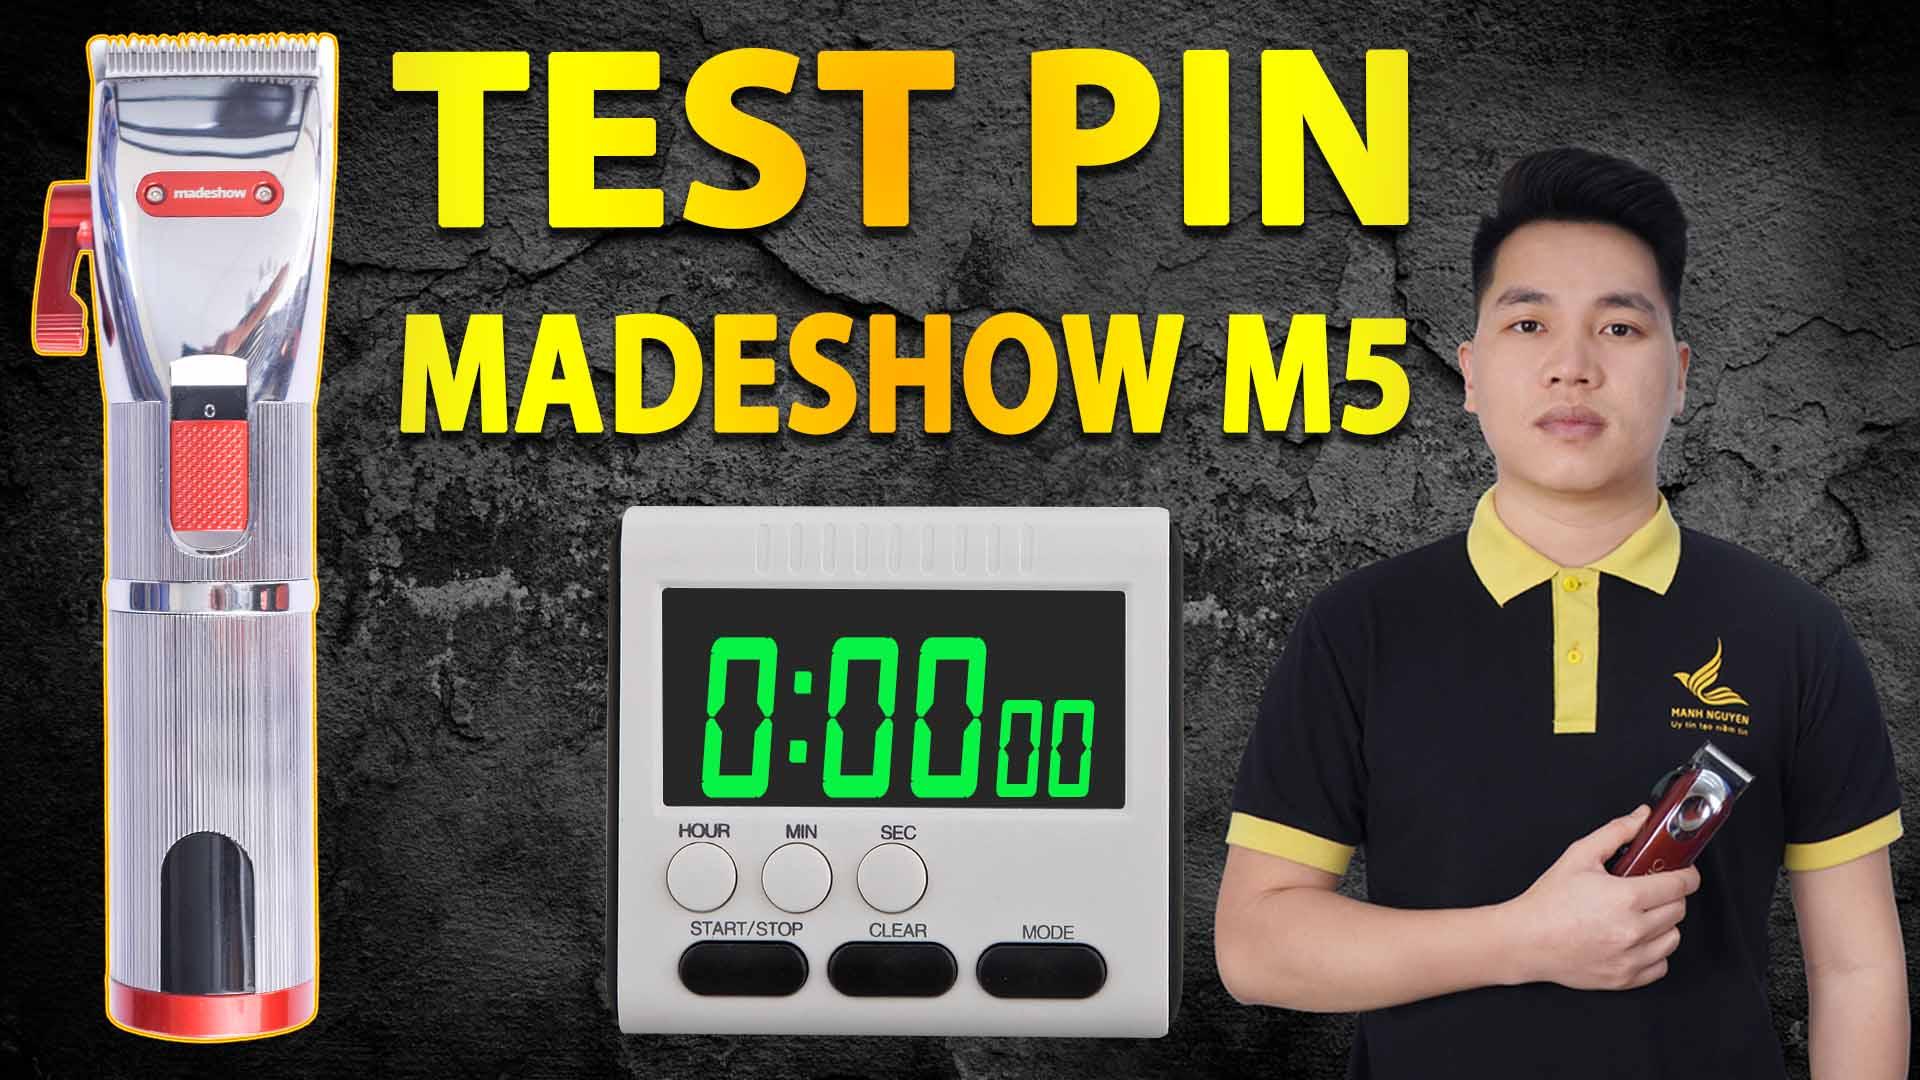 test pin tong do cat toc madeshow m5